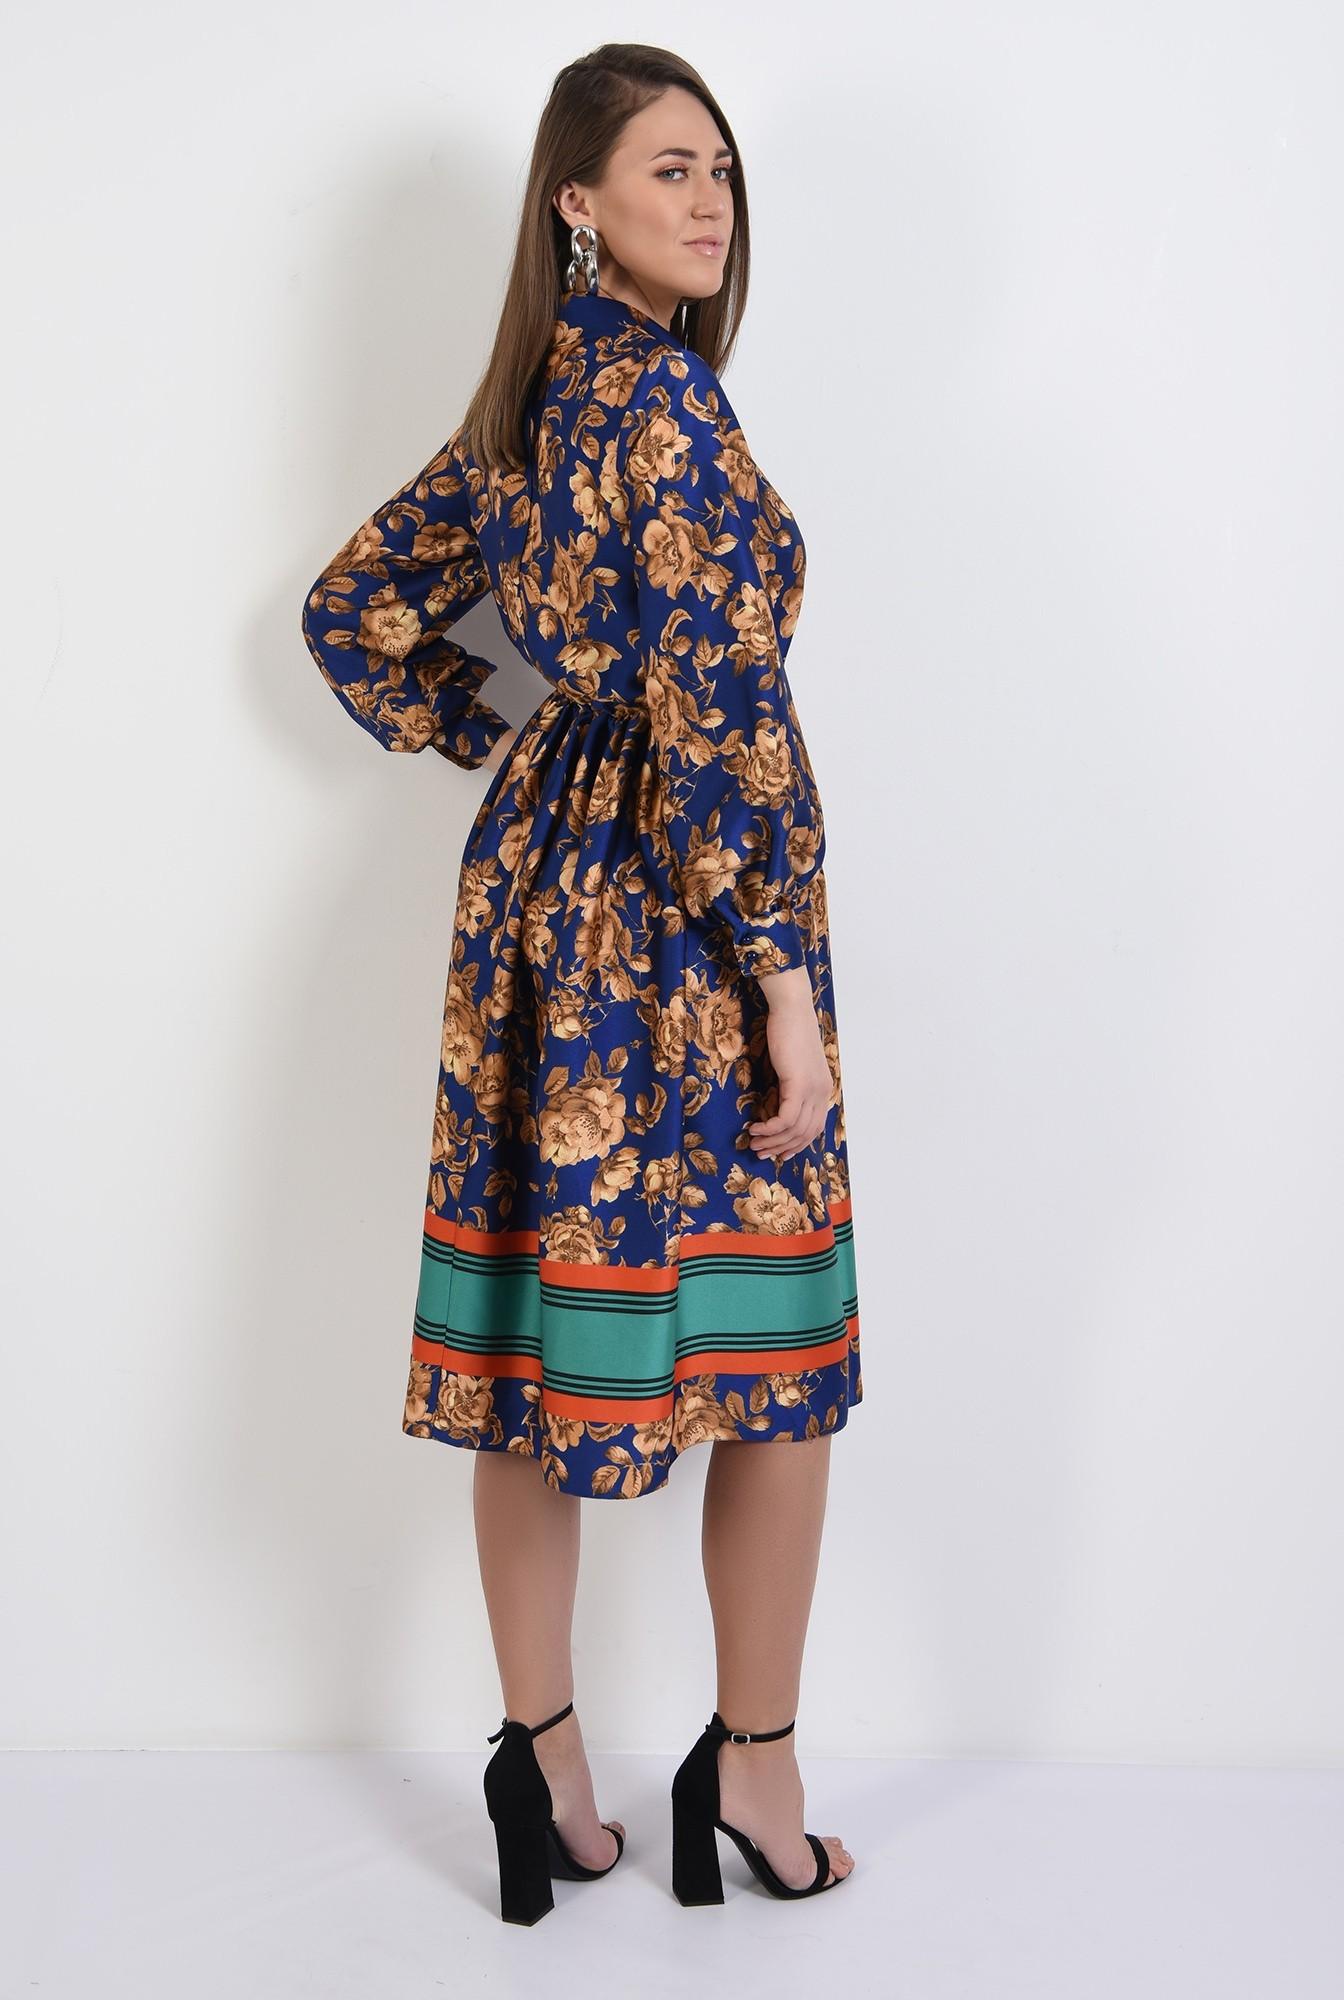 1 - 360 - rochie midi, evazata, satin, cu imprimeu floral